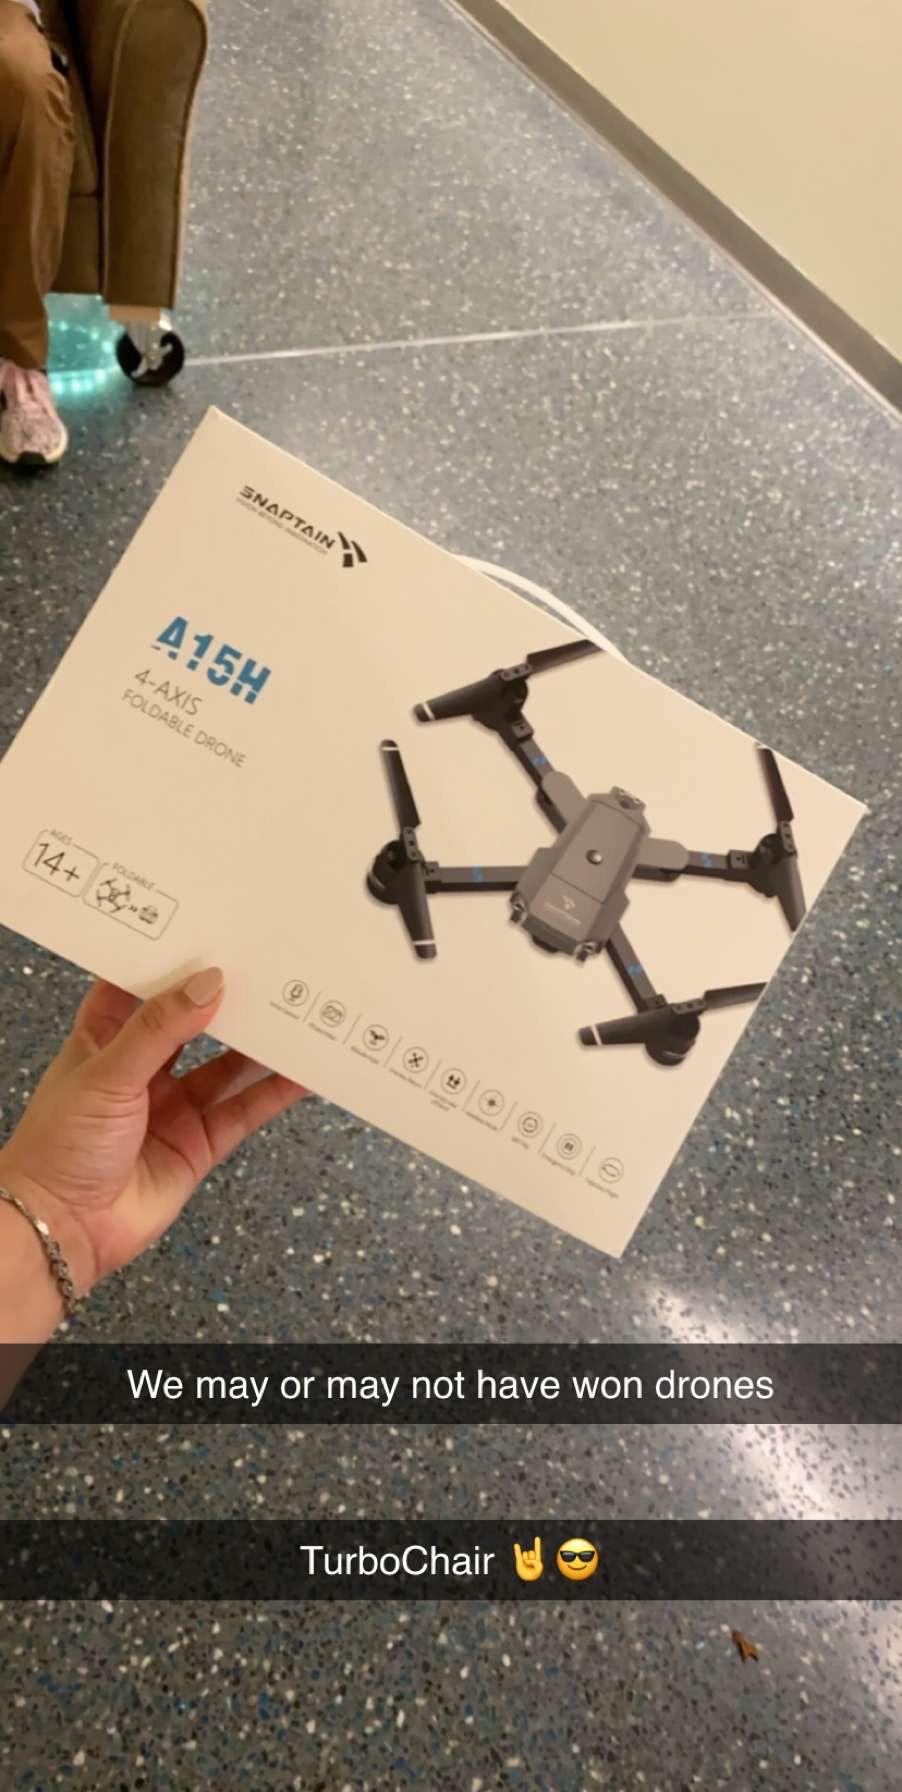 Drone prize